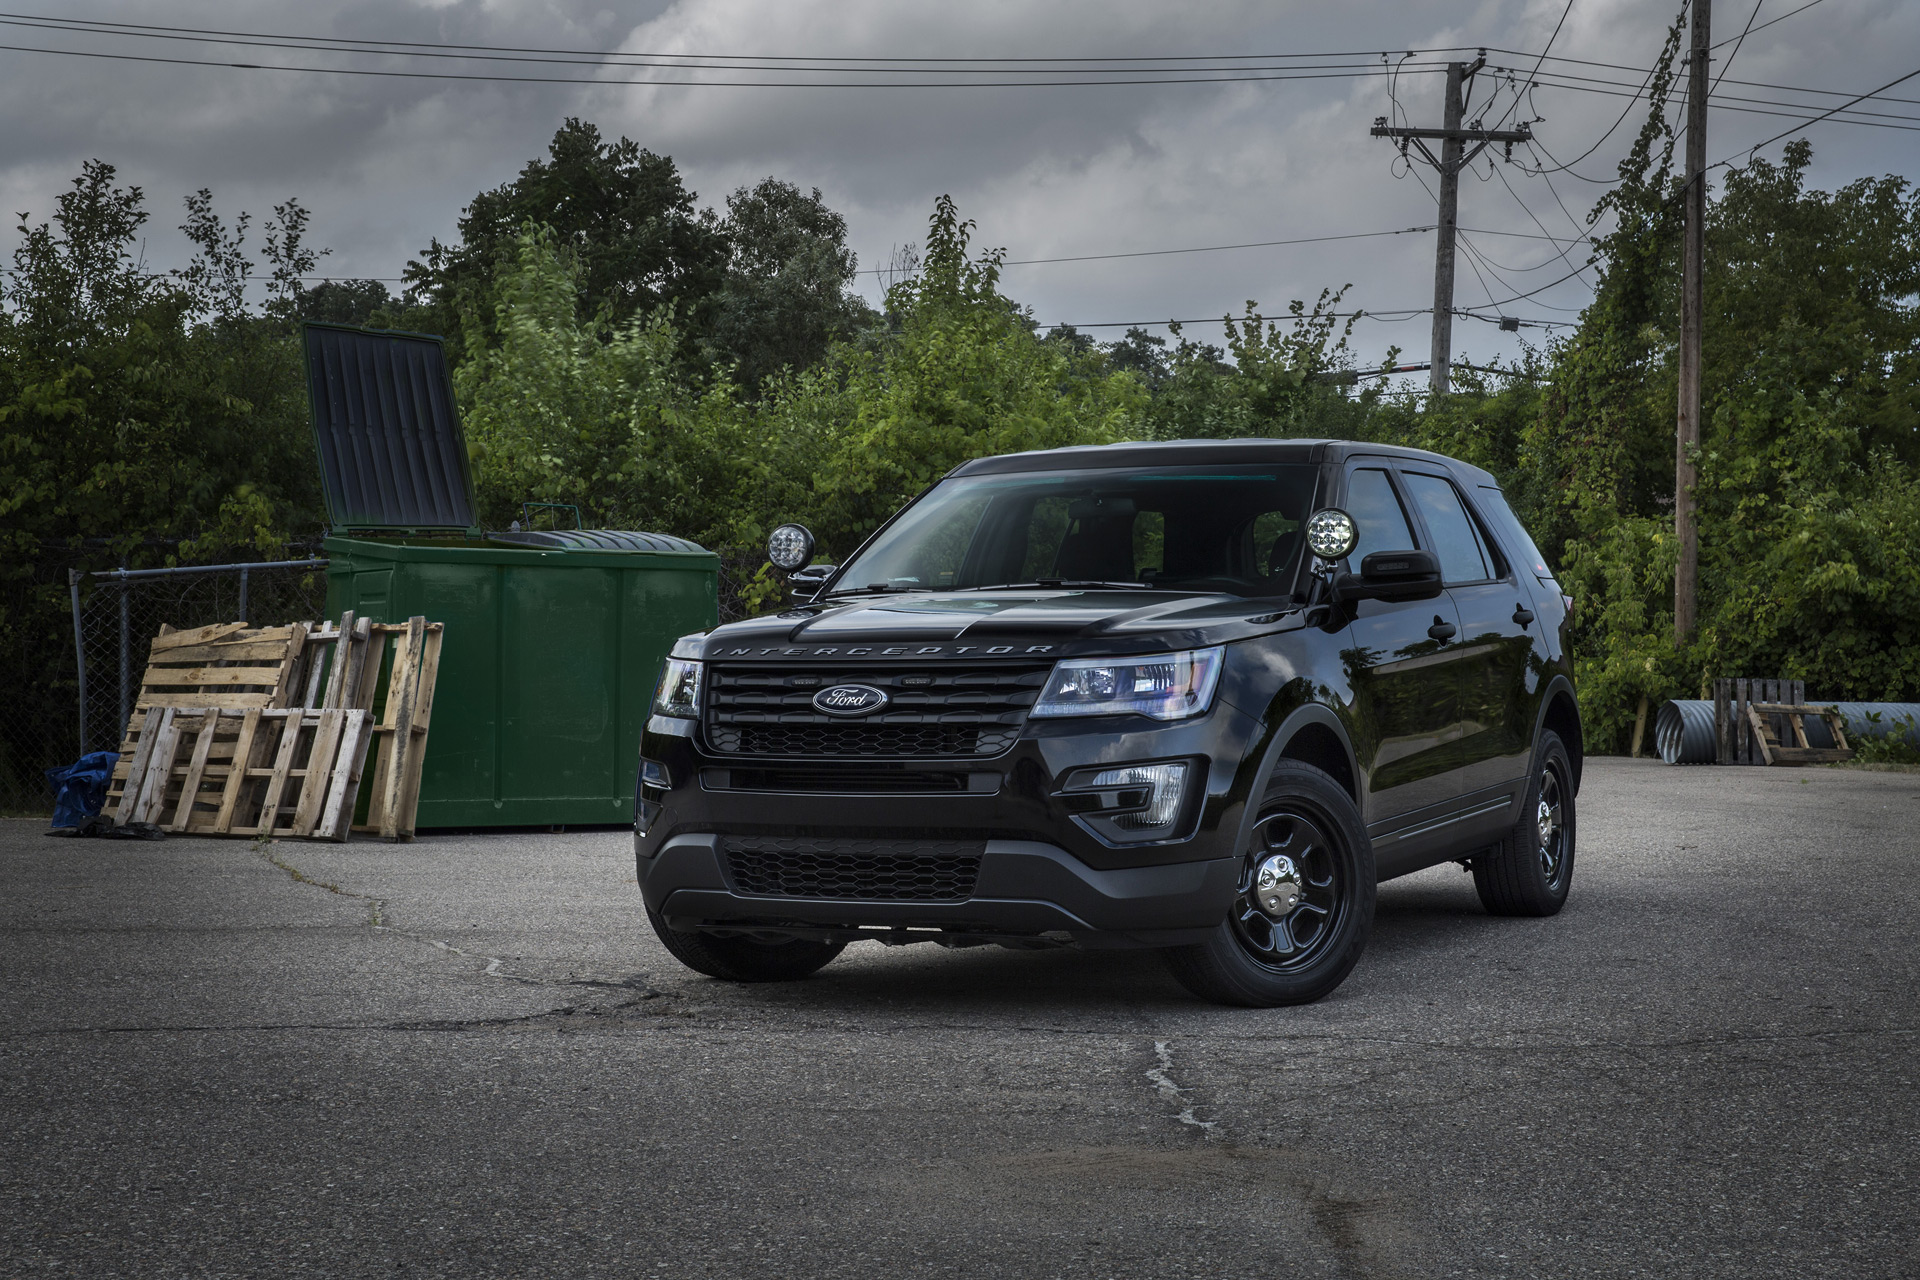 & Speeders beware: Ford develops stealthy light bar for cop cars markmcfarlin.com